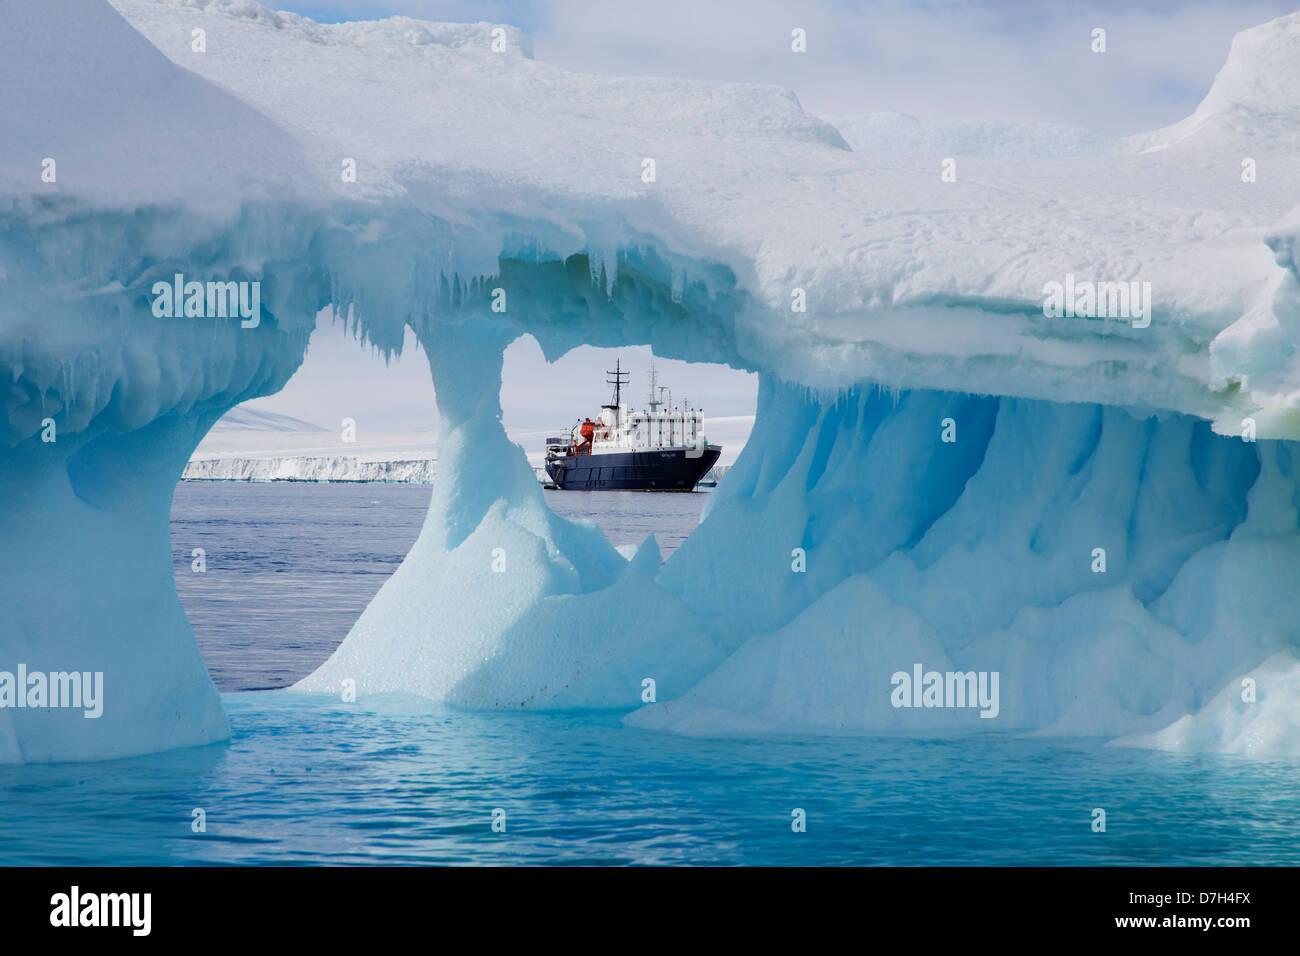 Icebreaker Ortelius through an Iceberg at Brown Bluff, Antarctica. - Stock Image